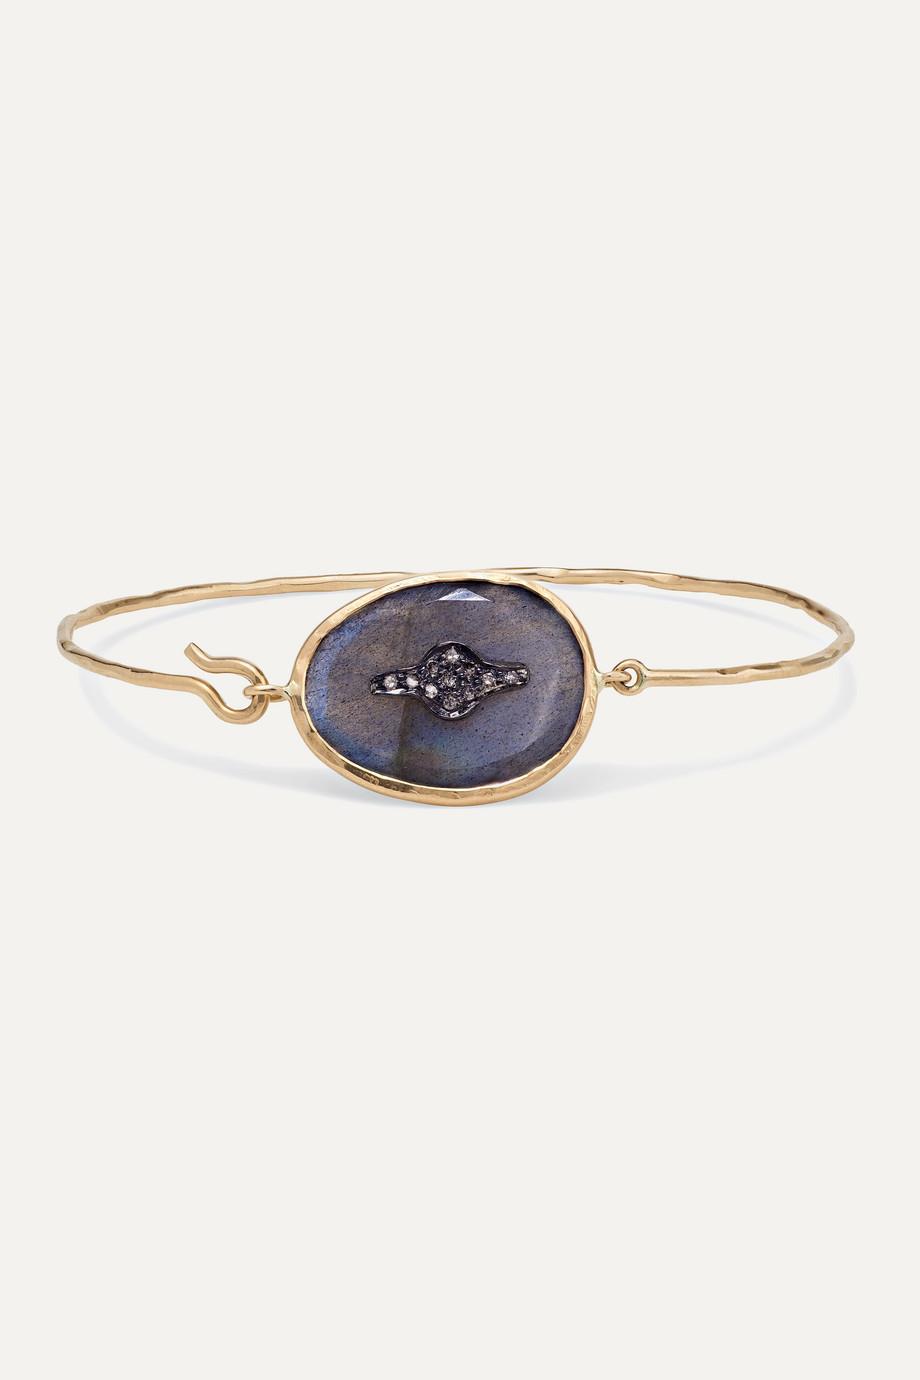 Pascale Monvoisin Bracelet en or rose 9 carats, argent sterling, labradorite et diamants Garance N°2